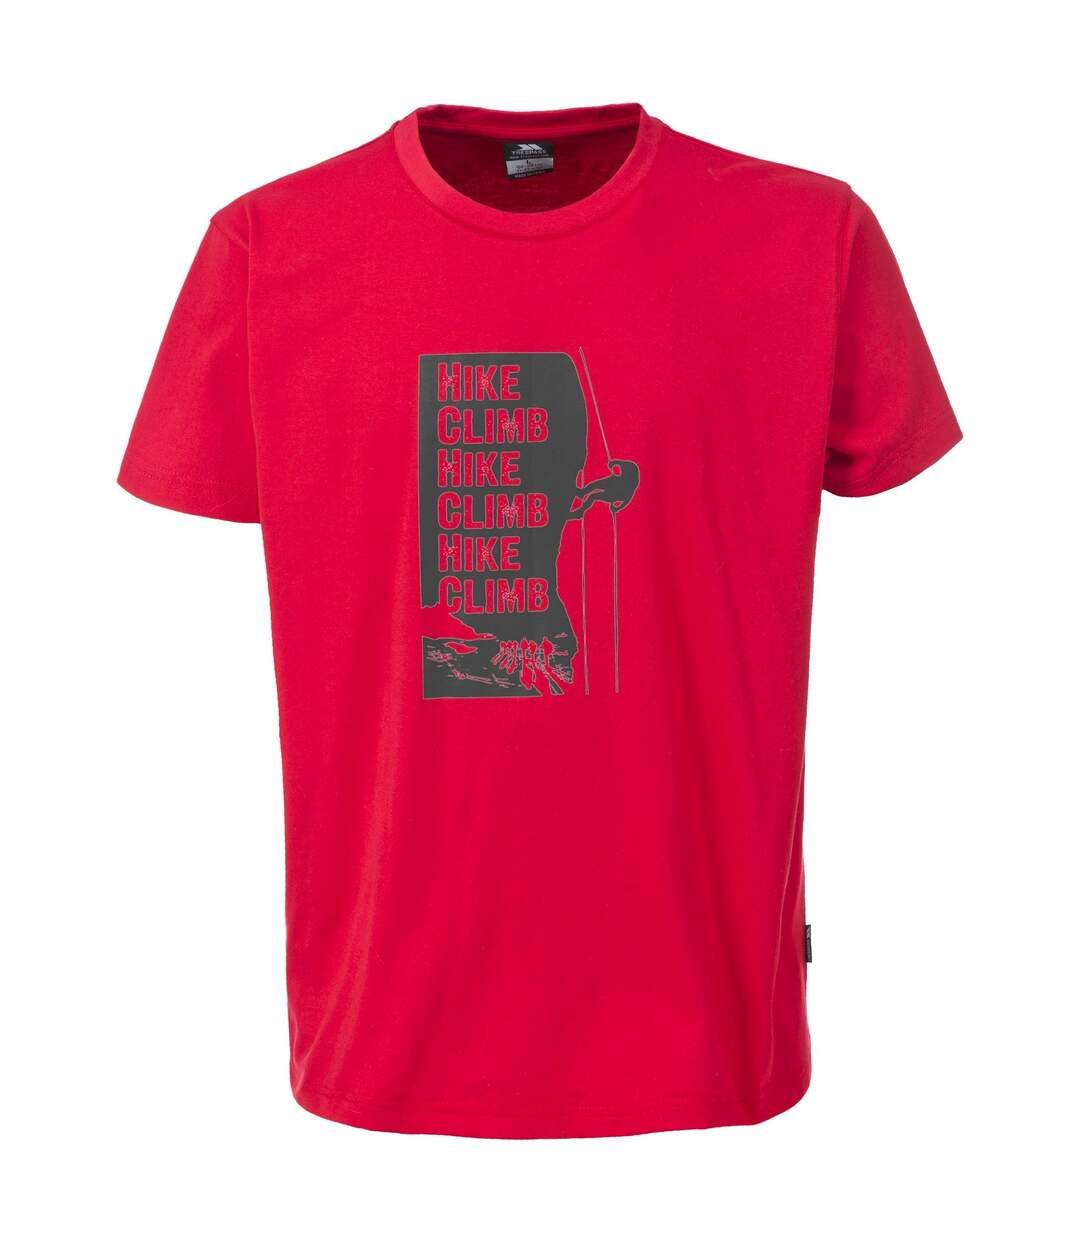 Trespass Tramore - T-shirt - Homme (Rouge) - UTTP3288